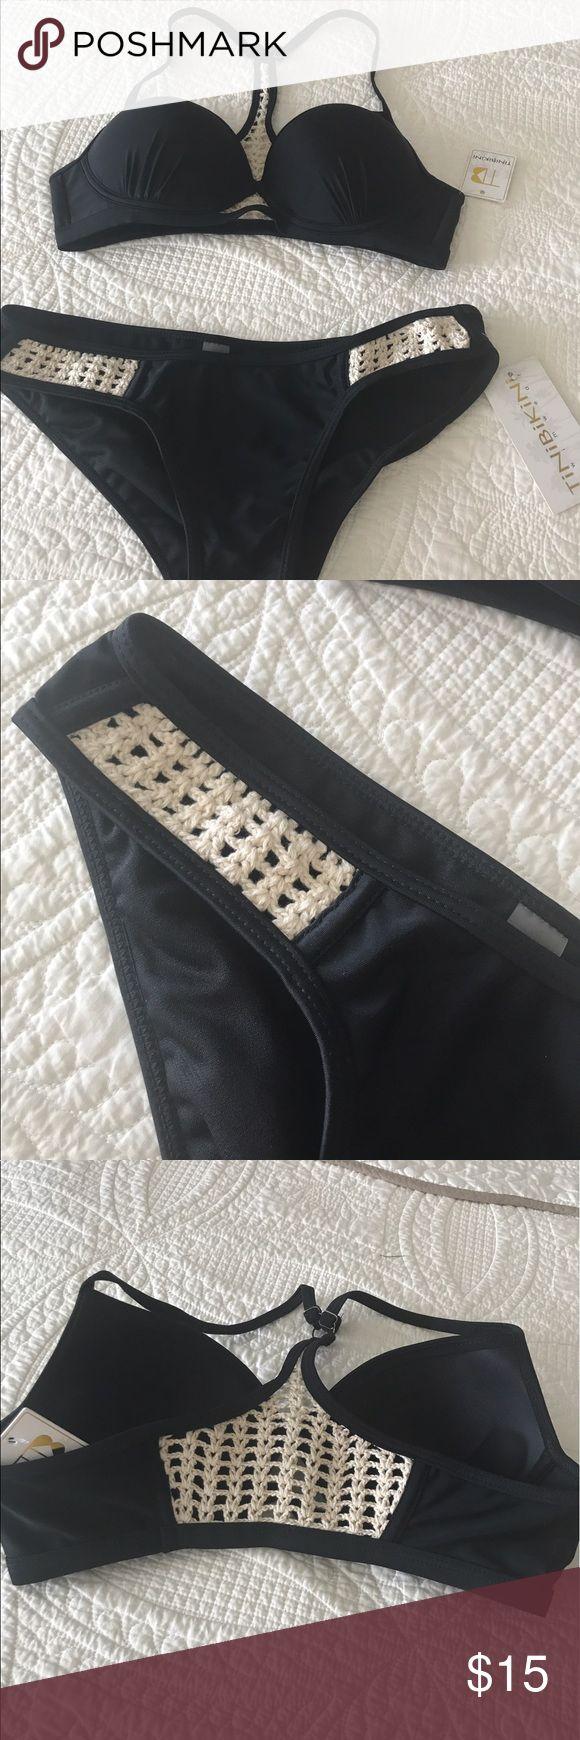 Bikini Tinibikini black and cream bikini.  Super cute,  crochet detail on sides of bottom and back of top.  Well padded.  Never worn,  tags still on.  The top is too small for me 🙁 tinibikini Swim Bikinis